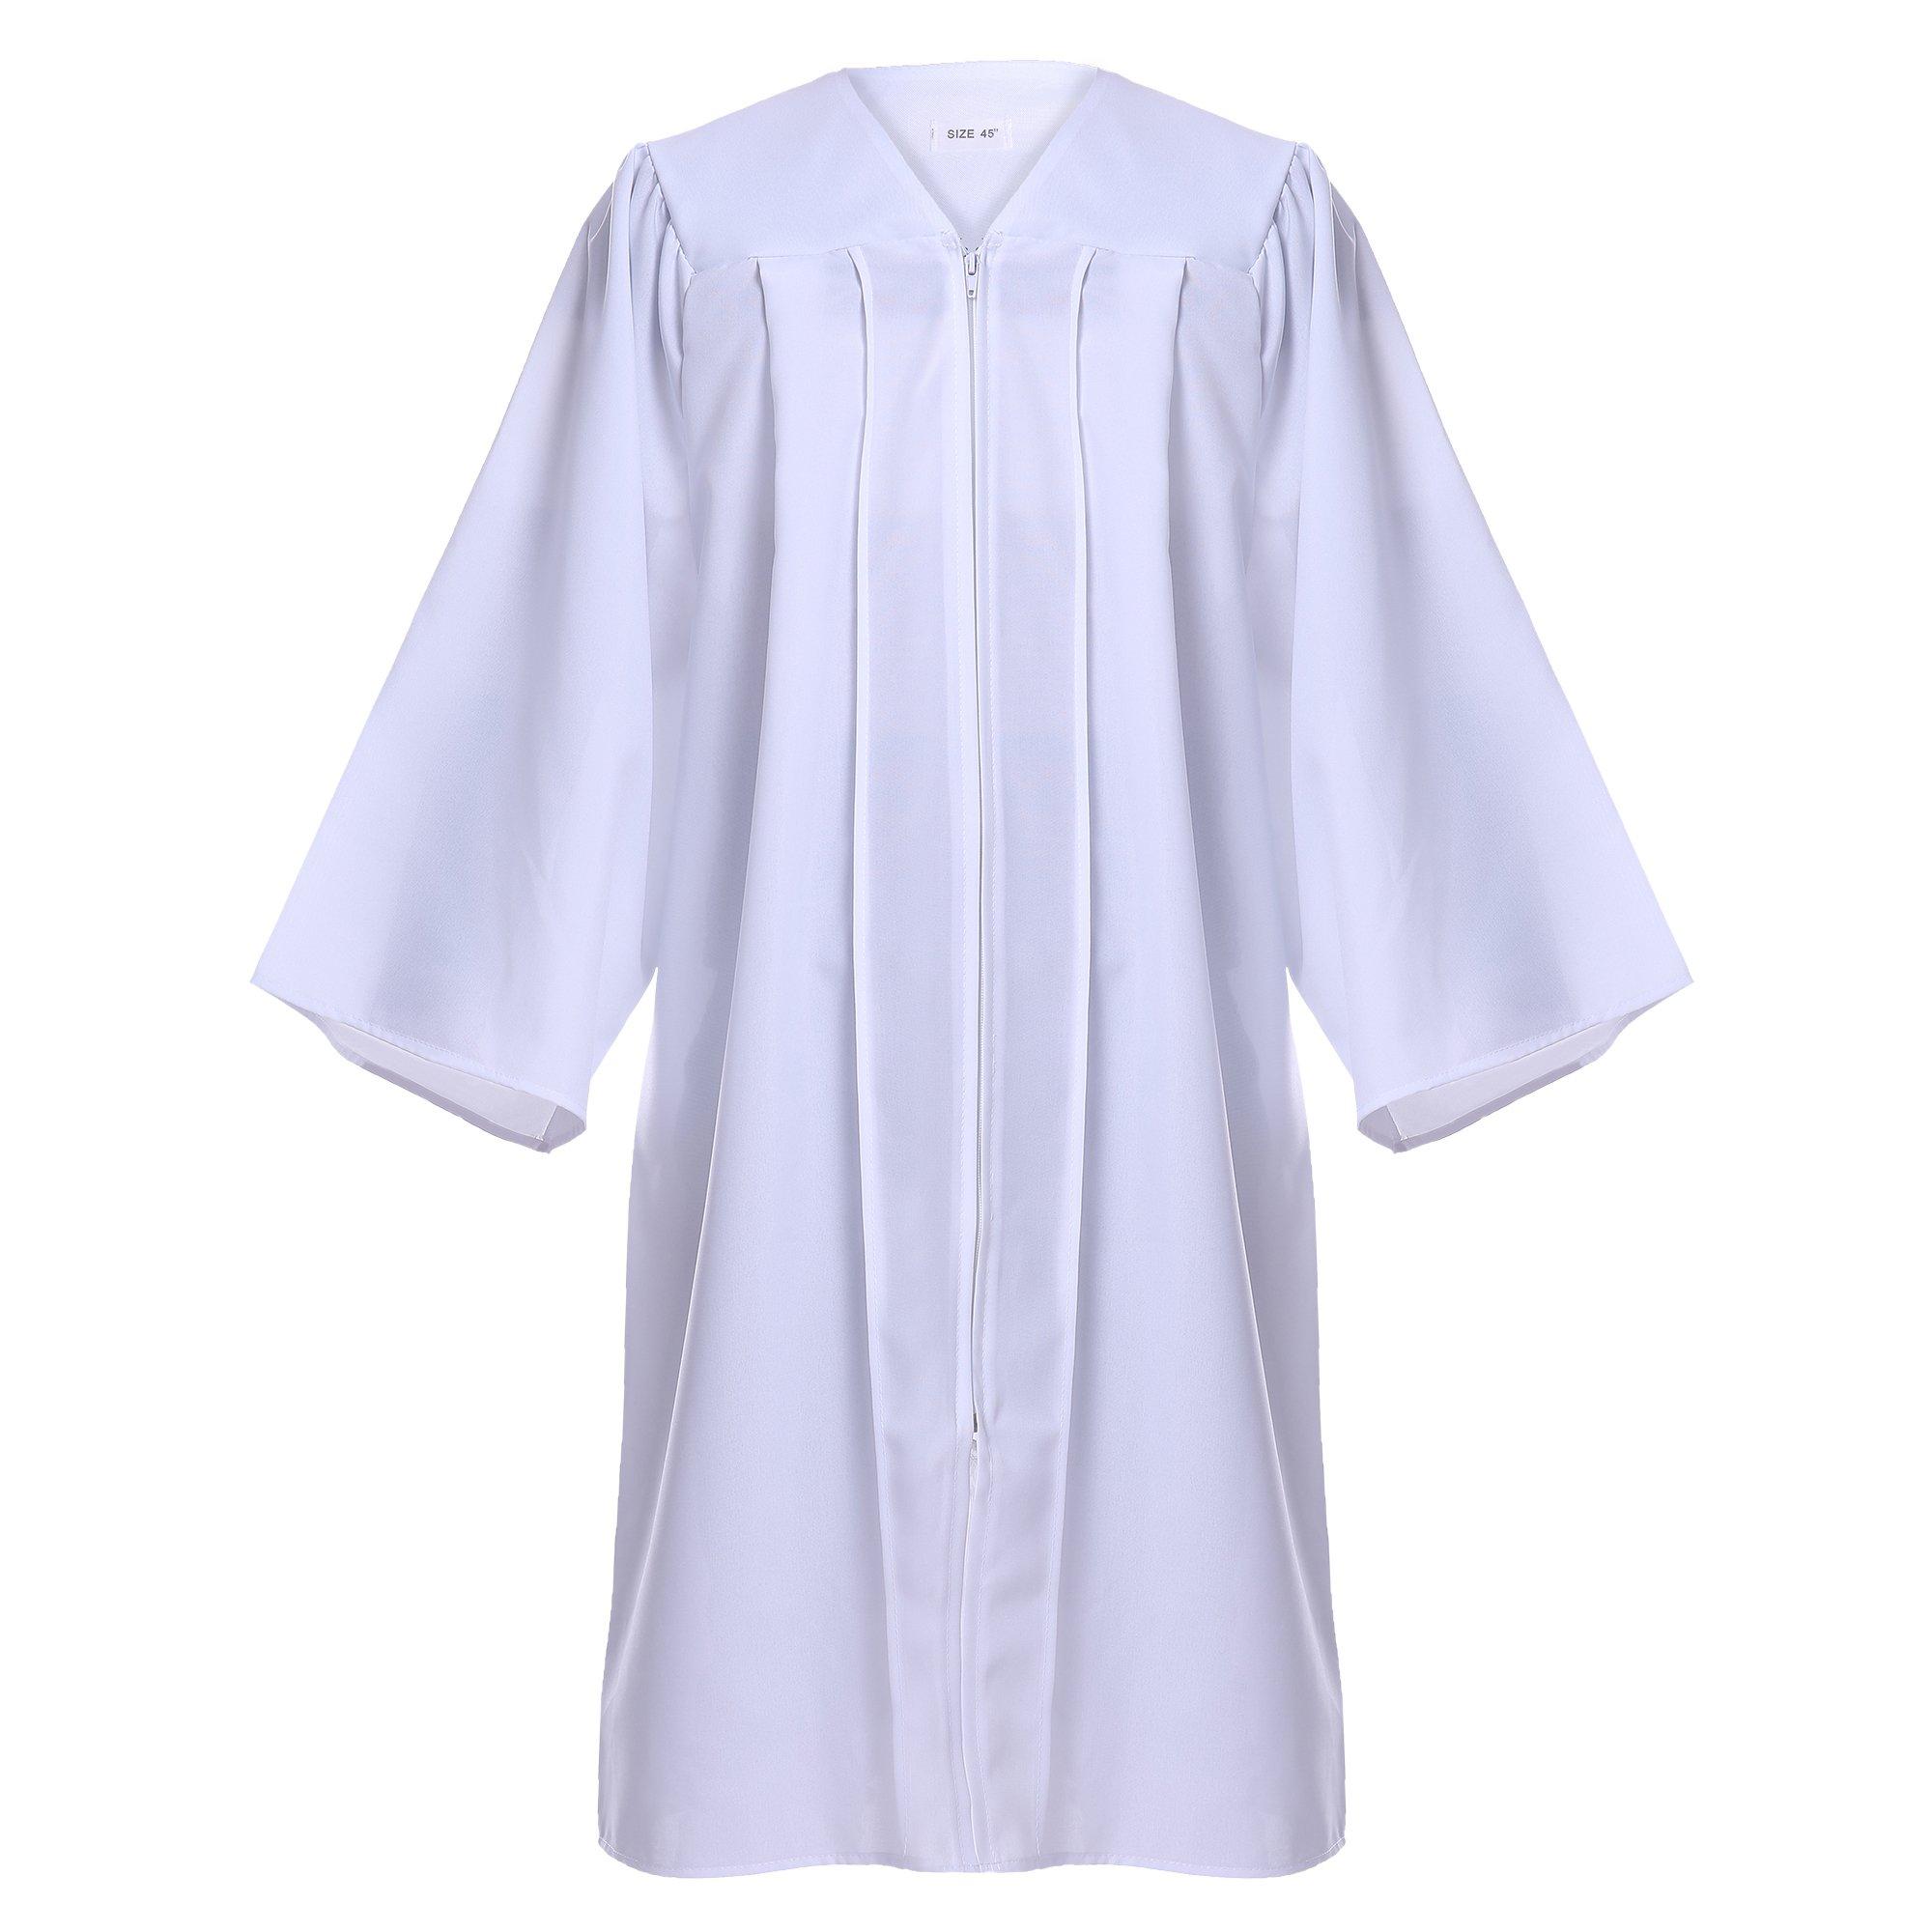 Newrara Unisex Premium Matte Graduation Gown Only (X-Large 54(5'9''-5'11''), White)